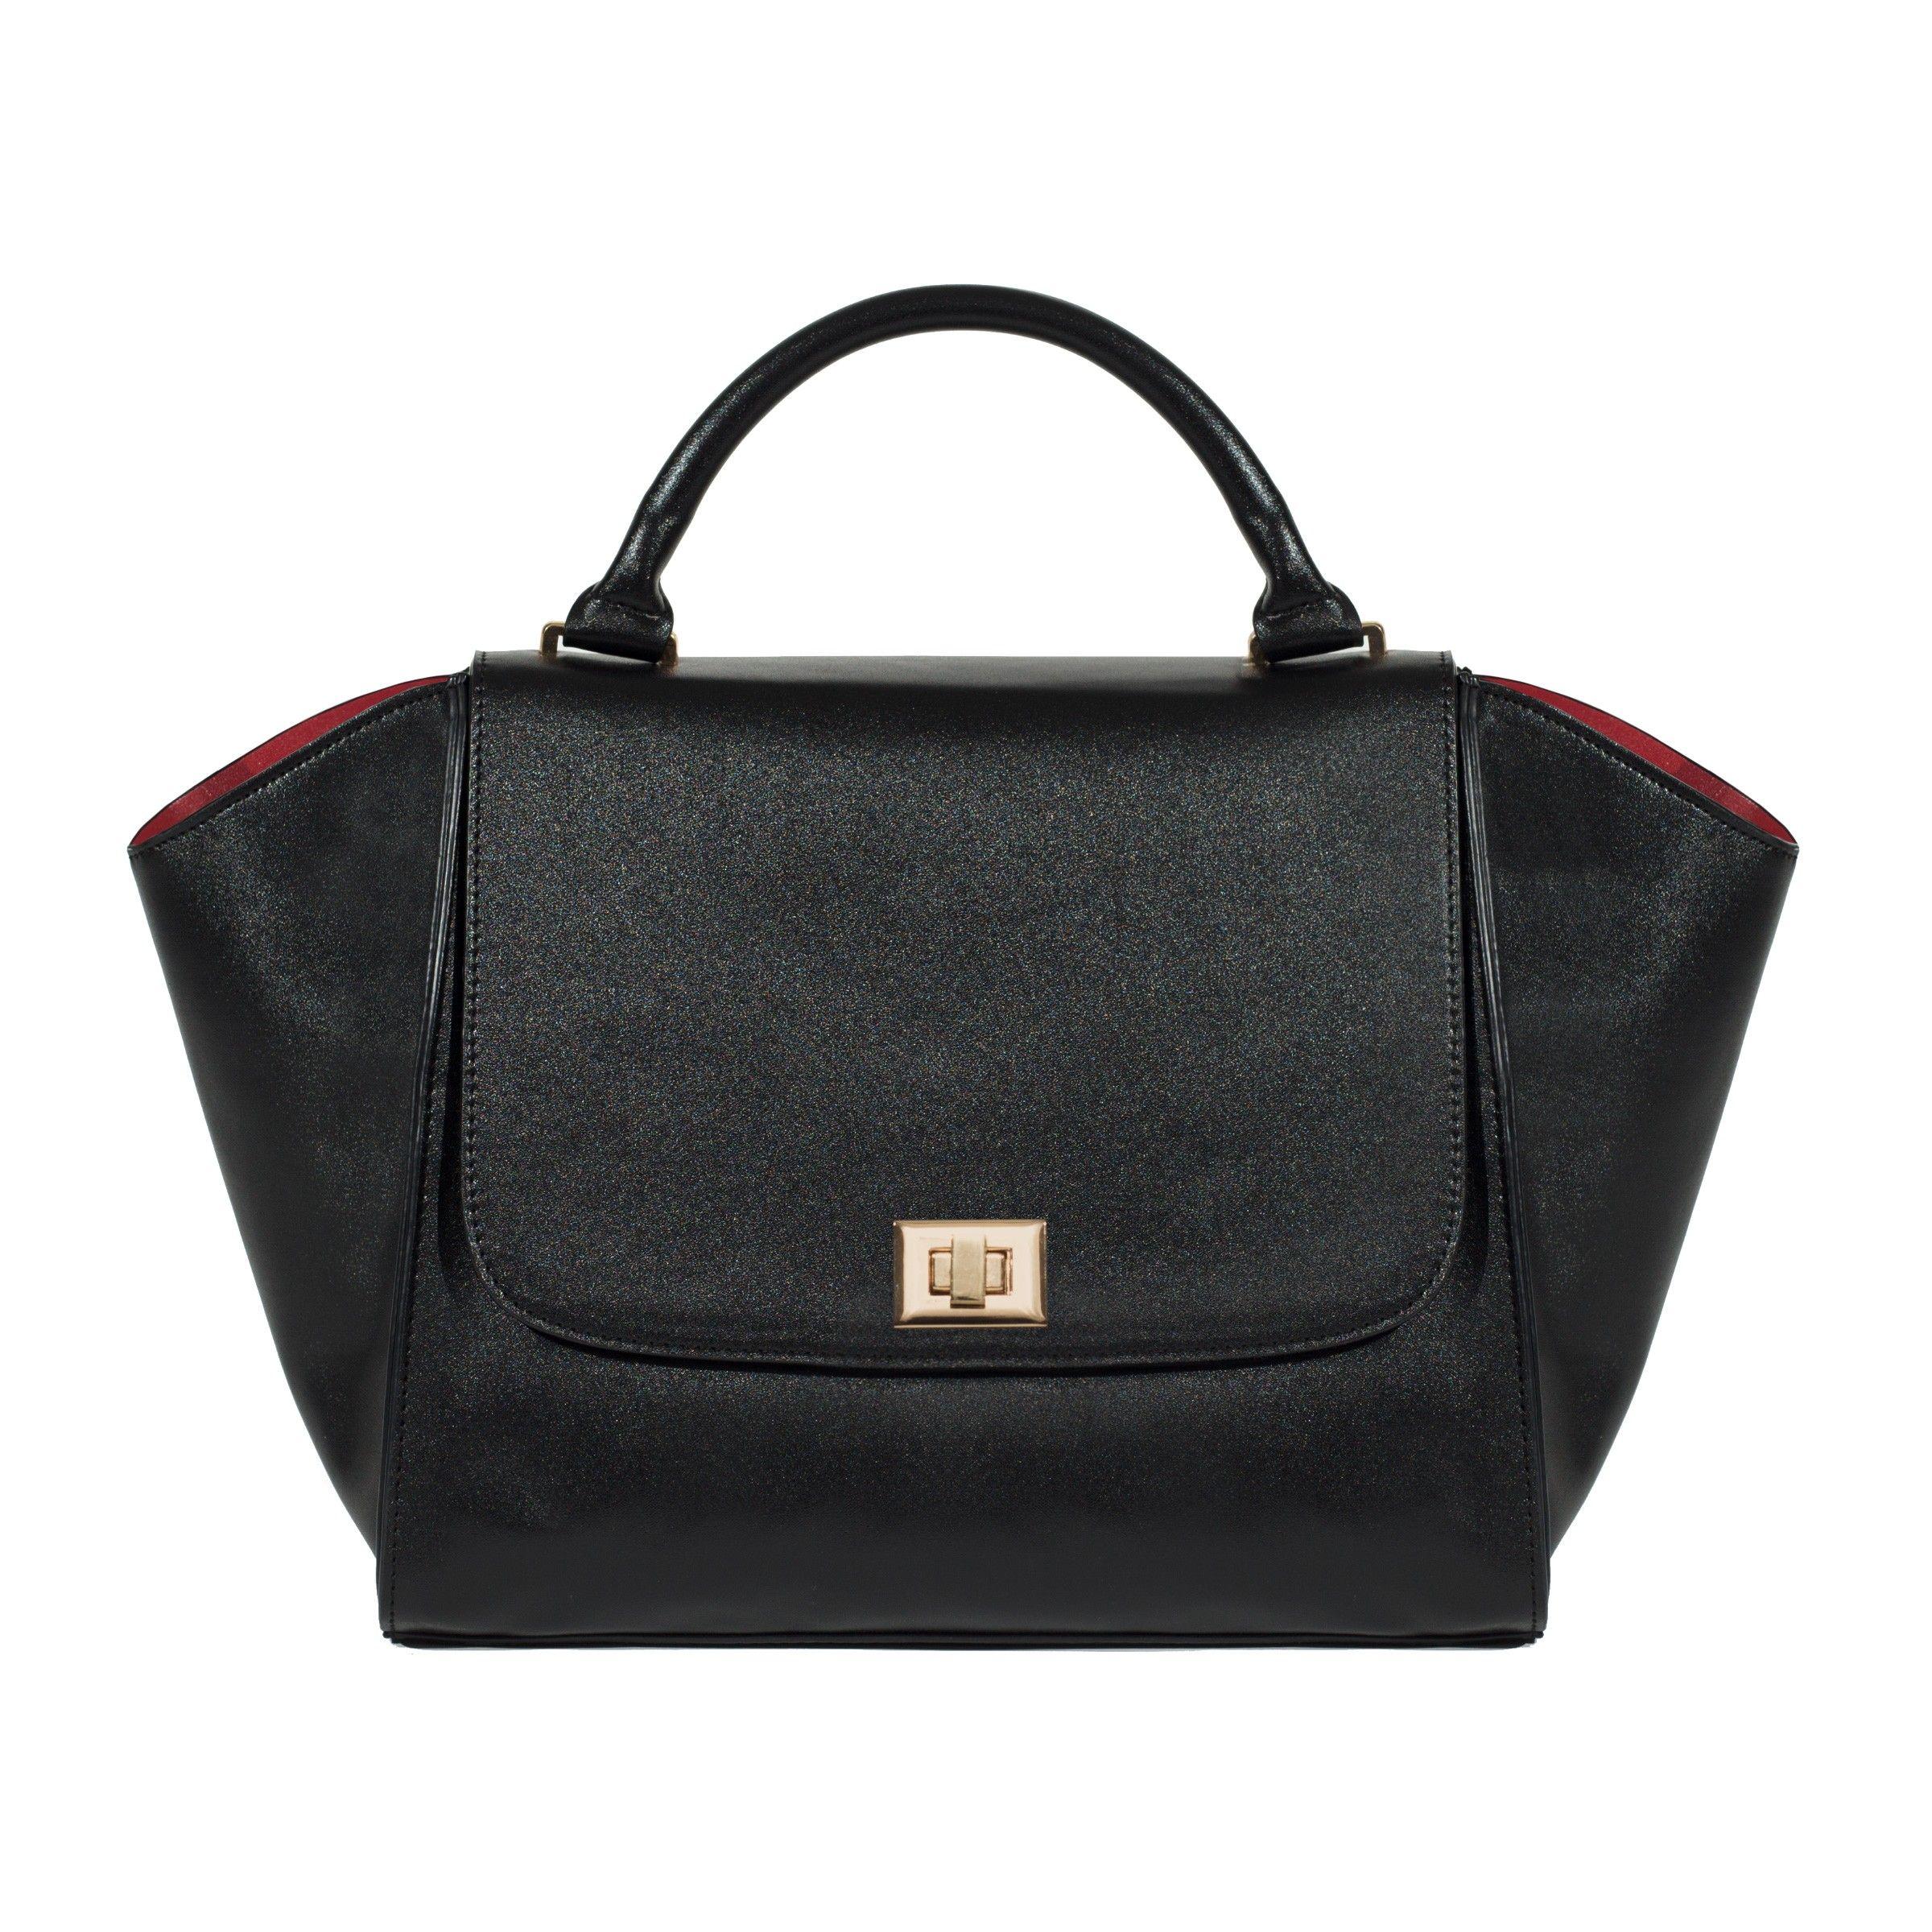 Marsi Bond Ginger Satchel Handbag Vegan Leather Purse With Washable Zip Out Lining